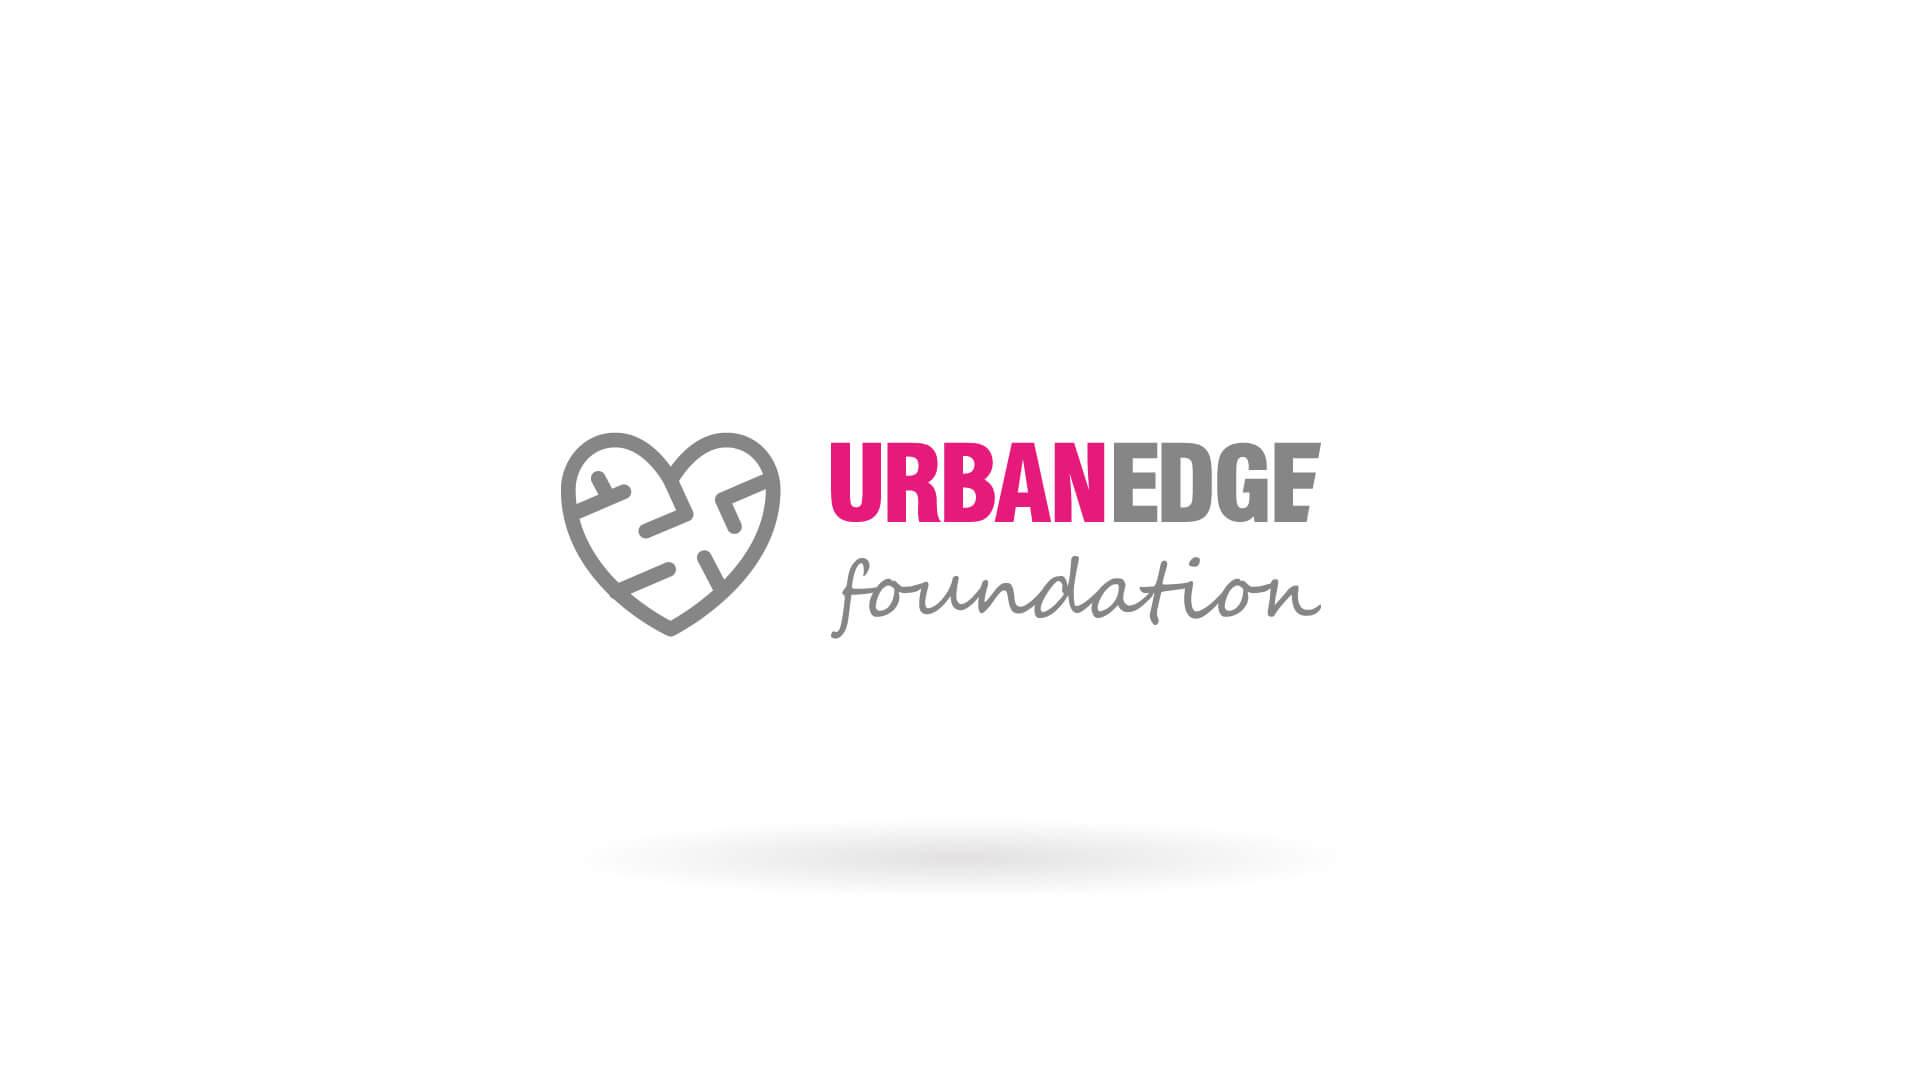 Urban Edge Foundation Brand